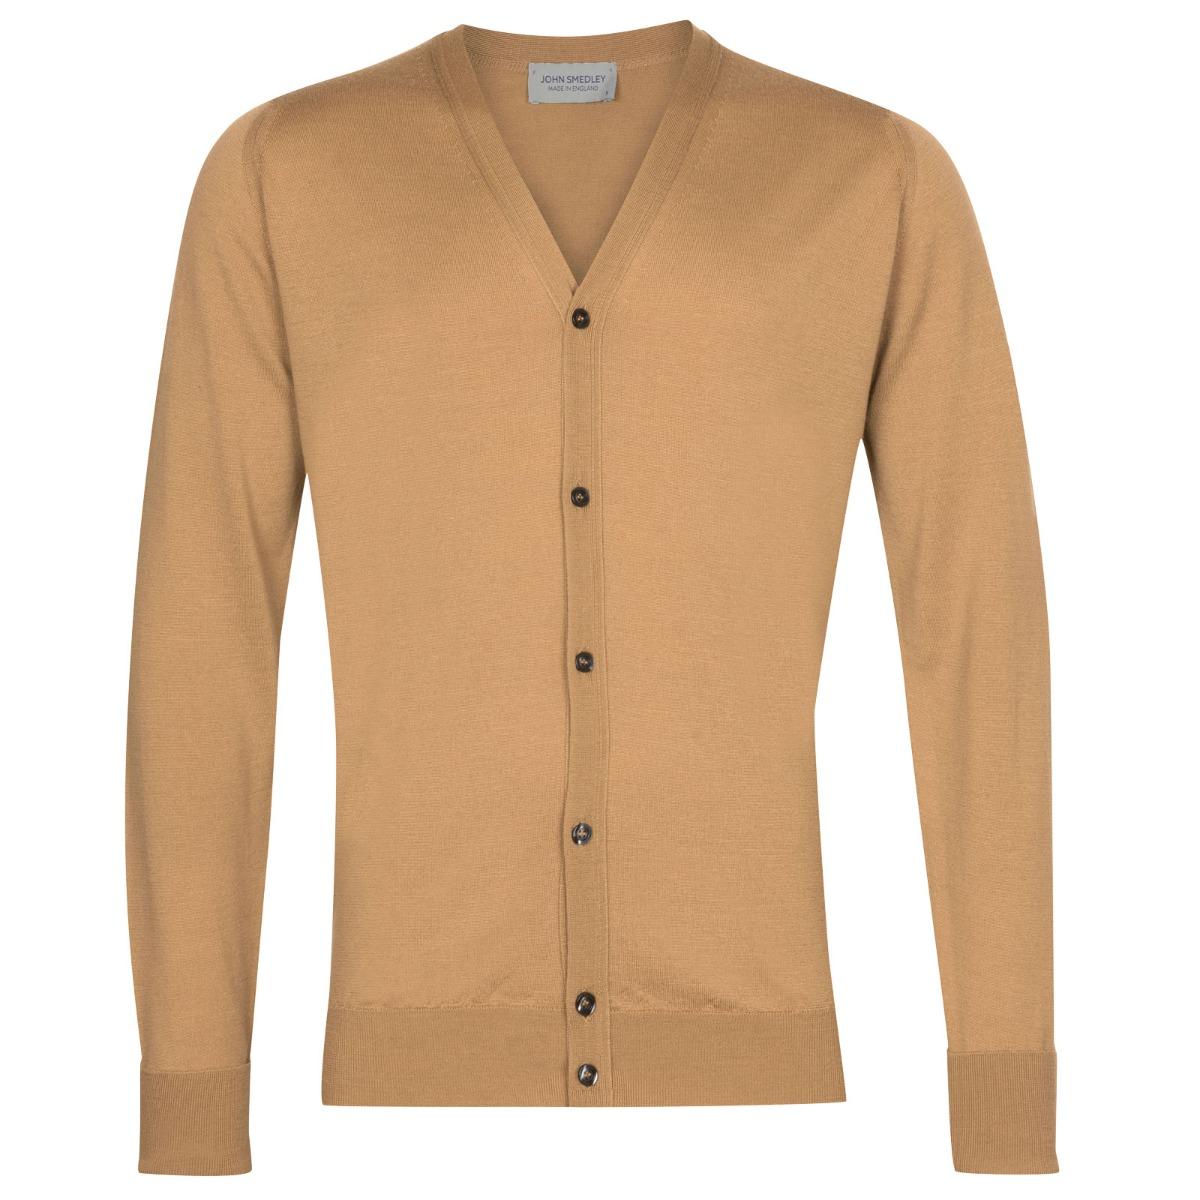 John Smedley Bryn Merino Wool Cardigan in Light Camel-M